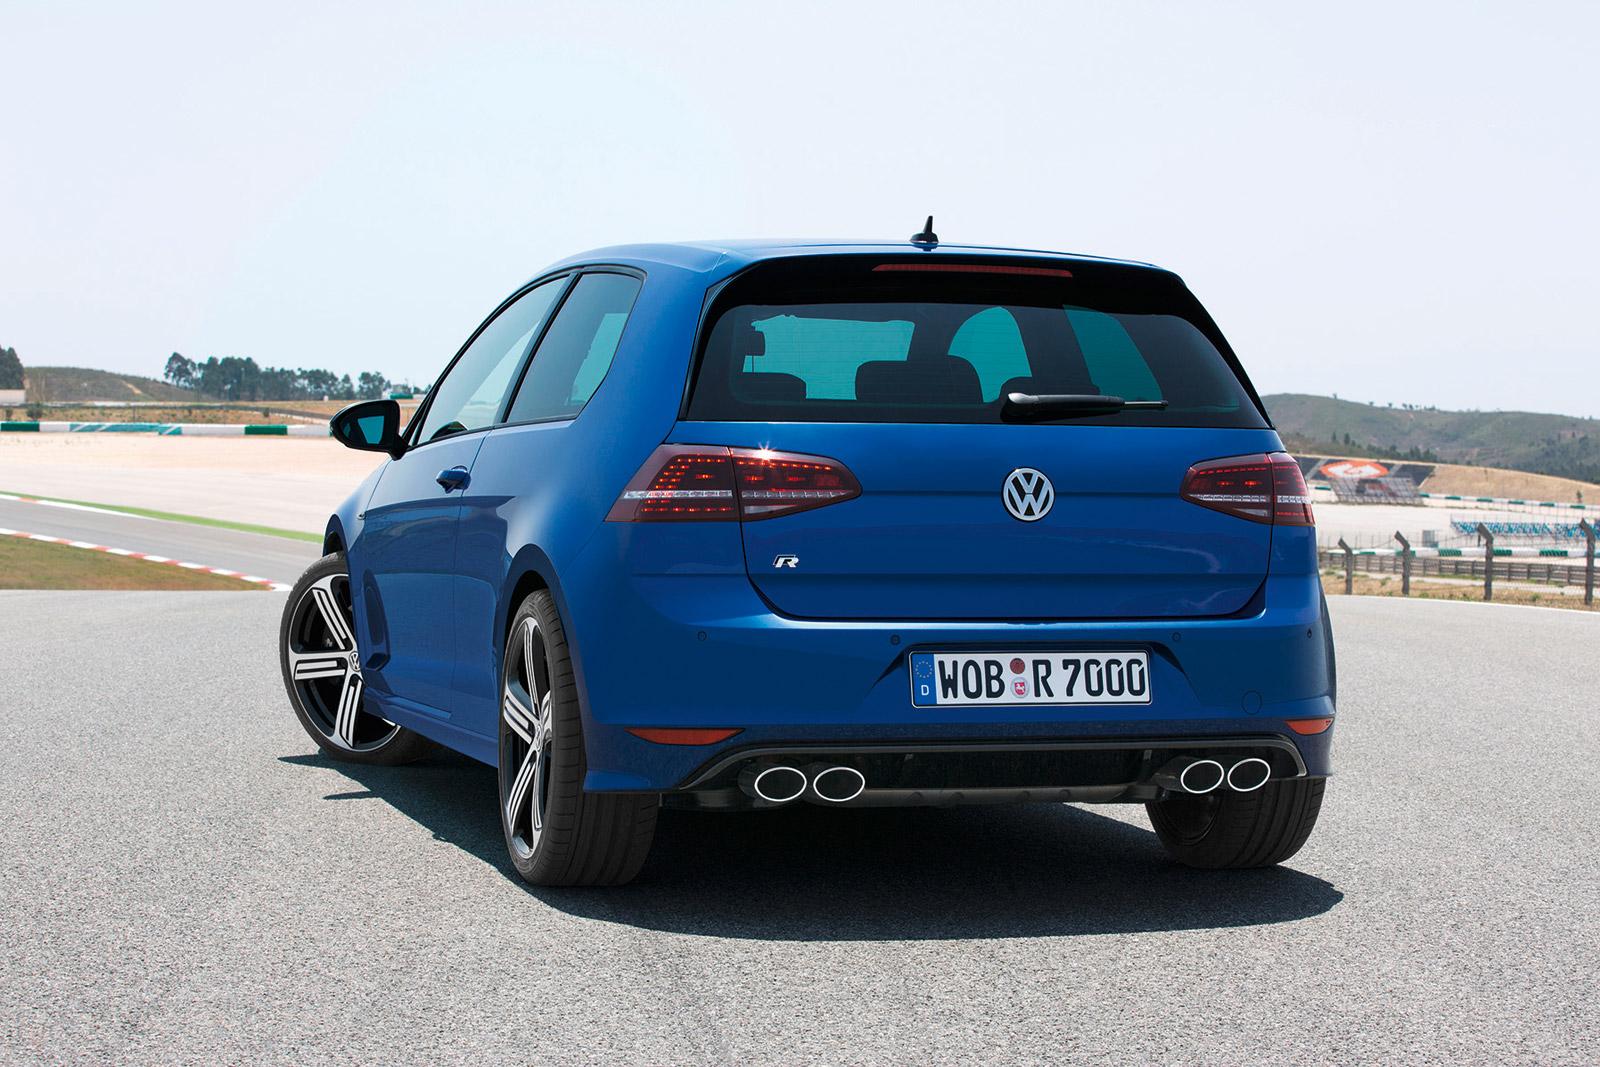 vw golf supercharged turbocharged